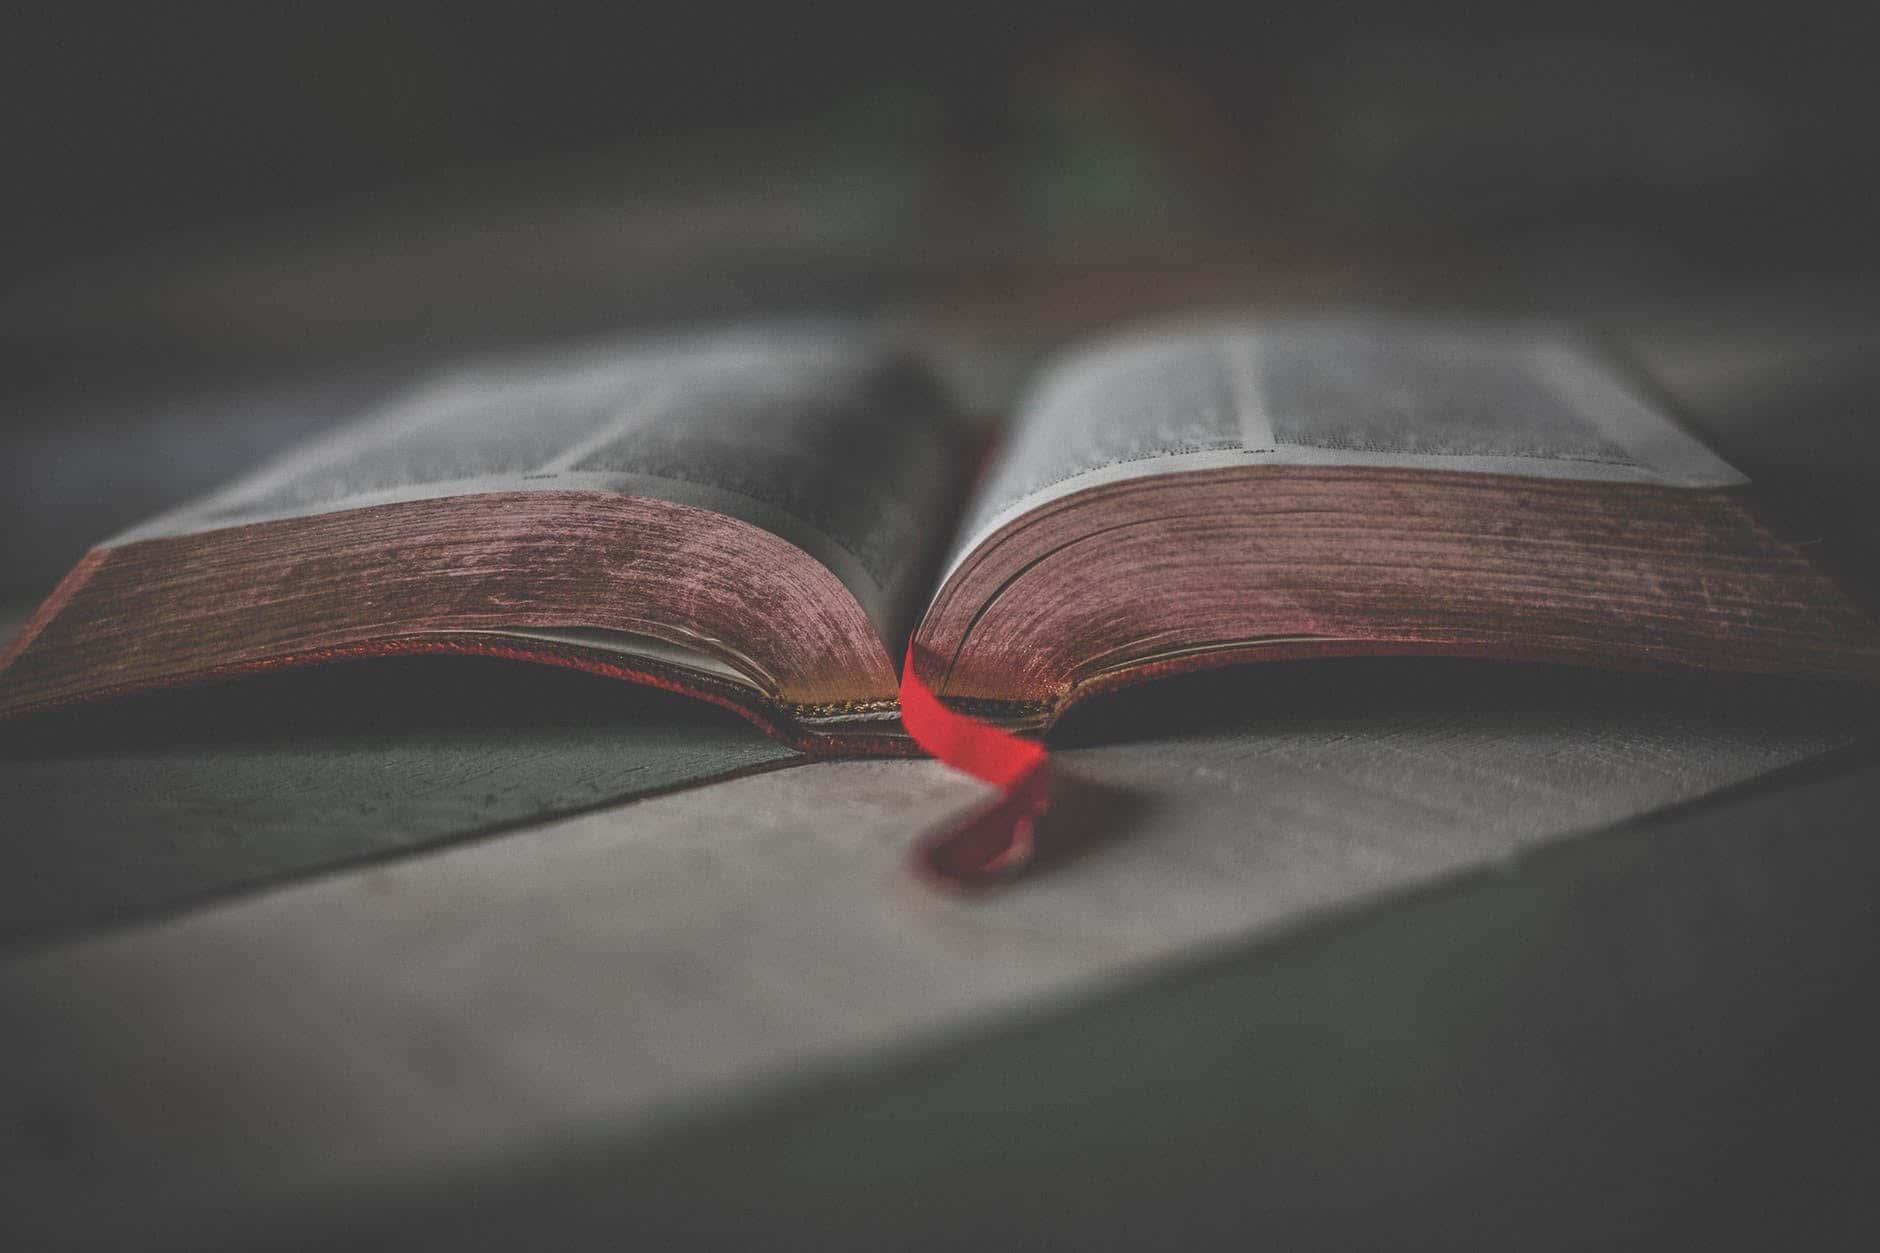 Bibelen - Gudstjeneste